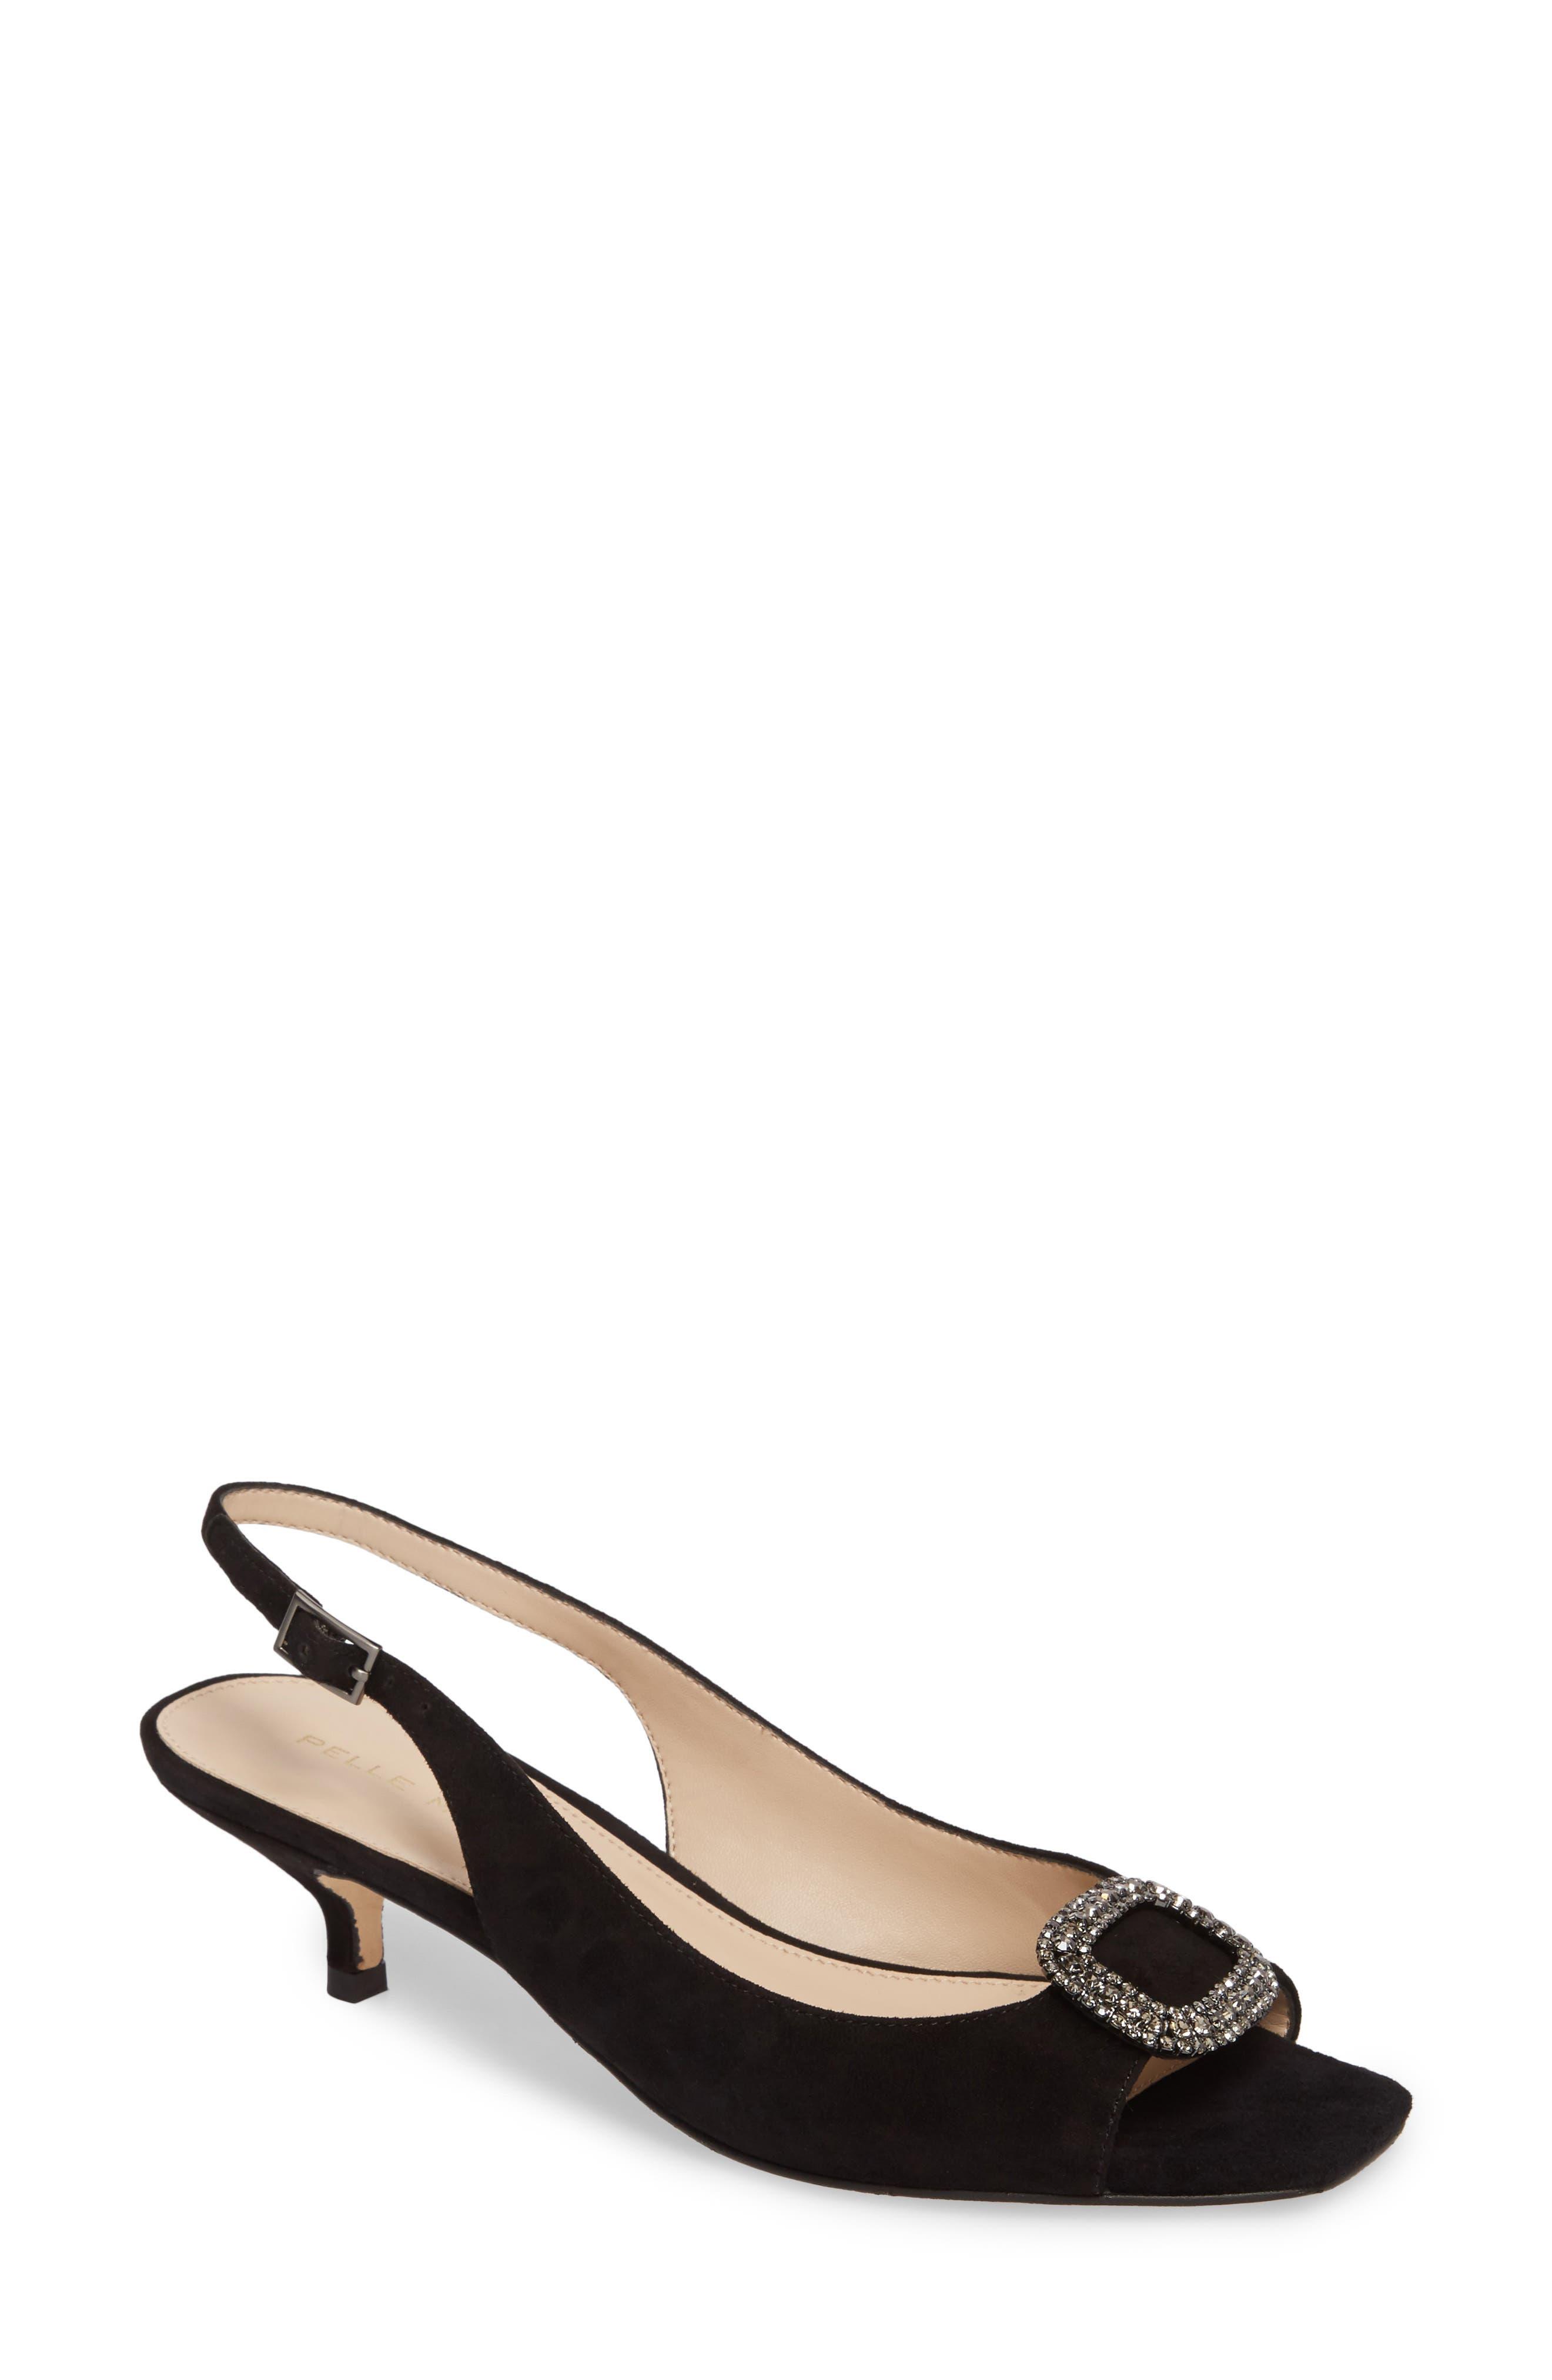 Main Image - Pelle Moda Fresca Slingback Sandal (Women)